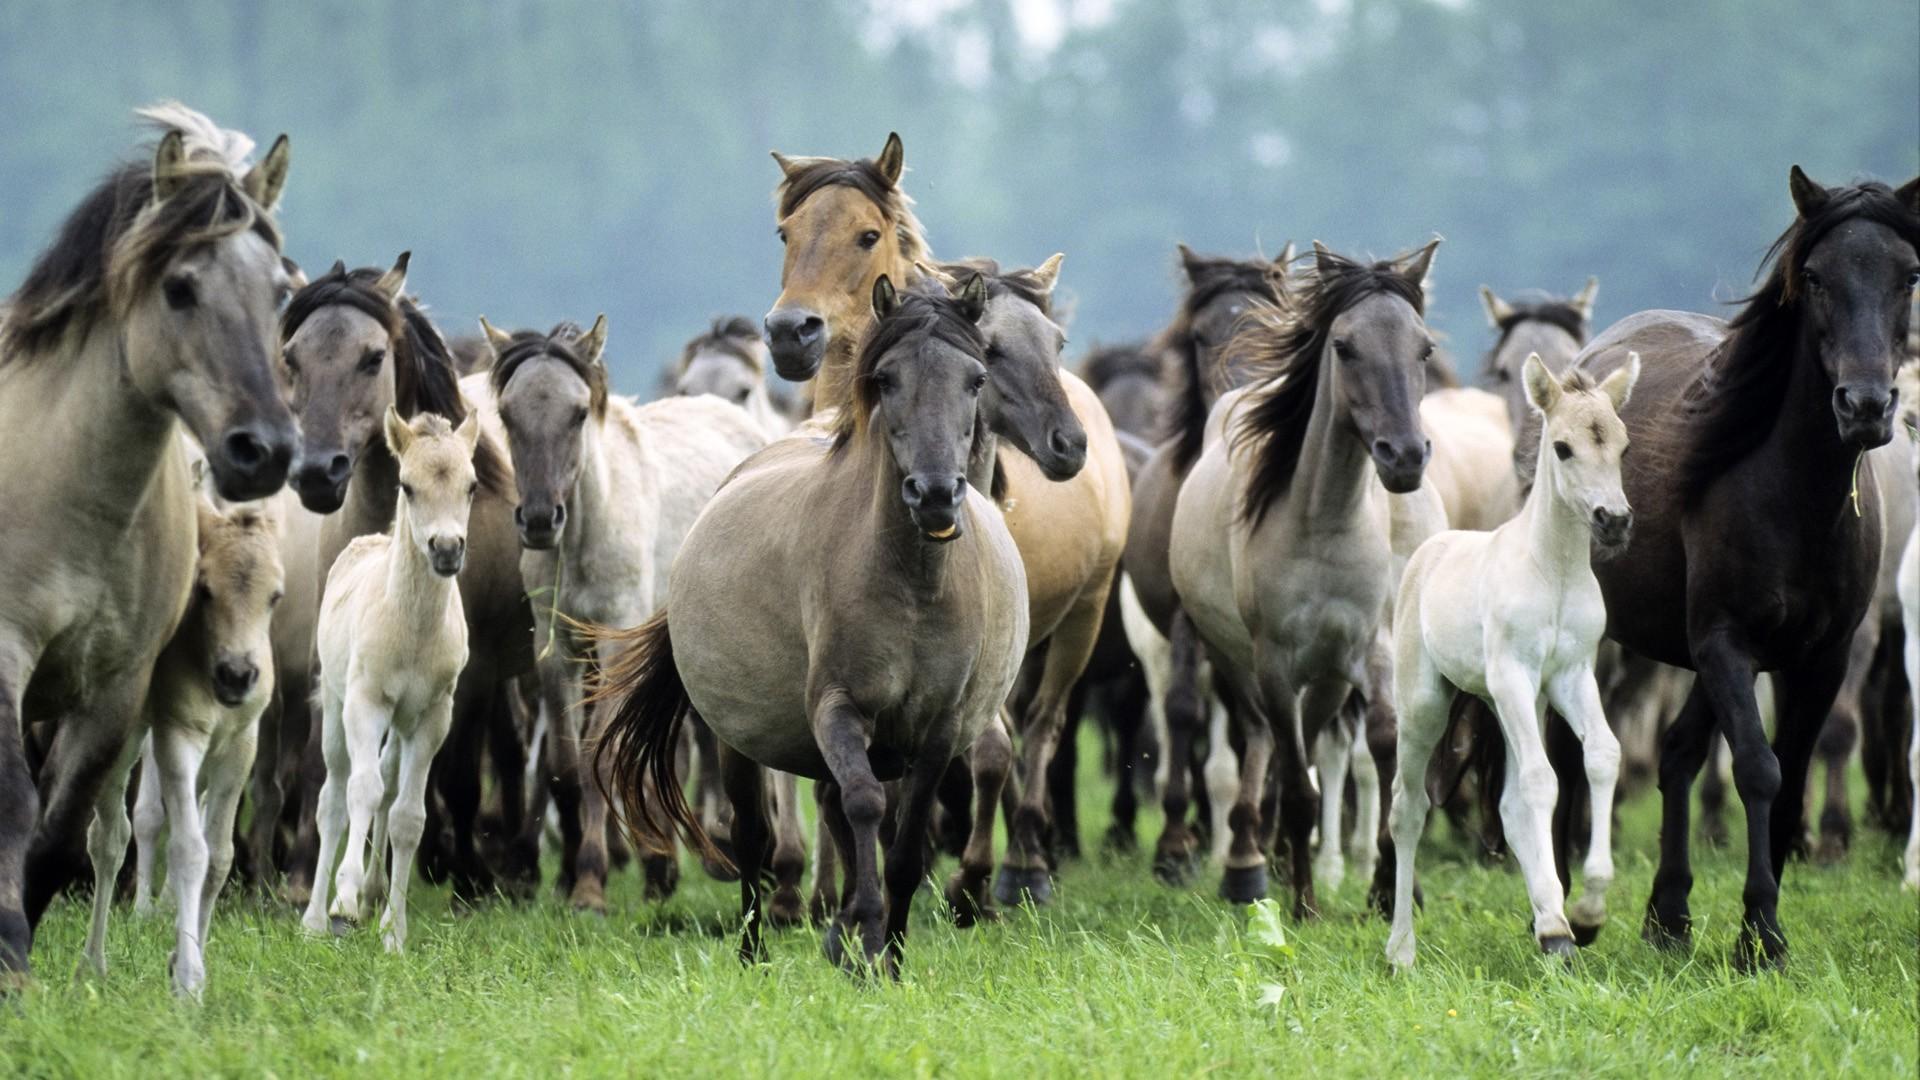 Germany wildlife horses running